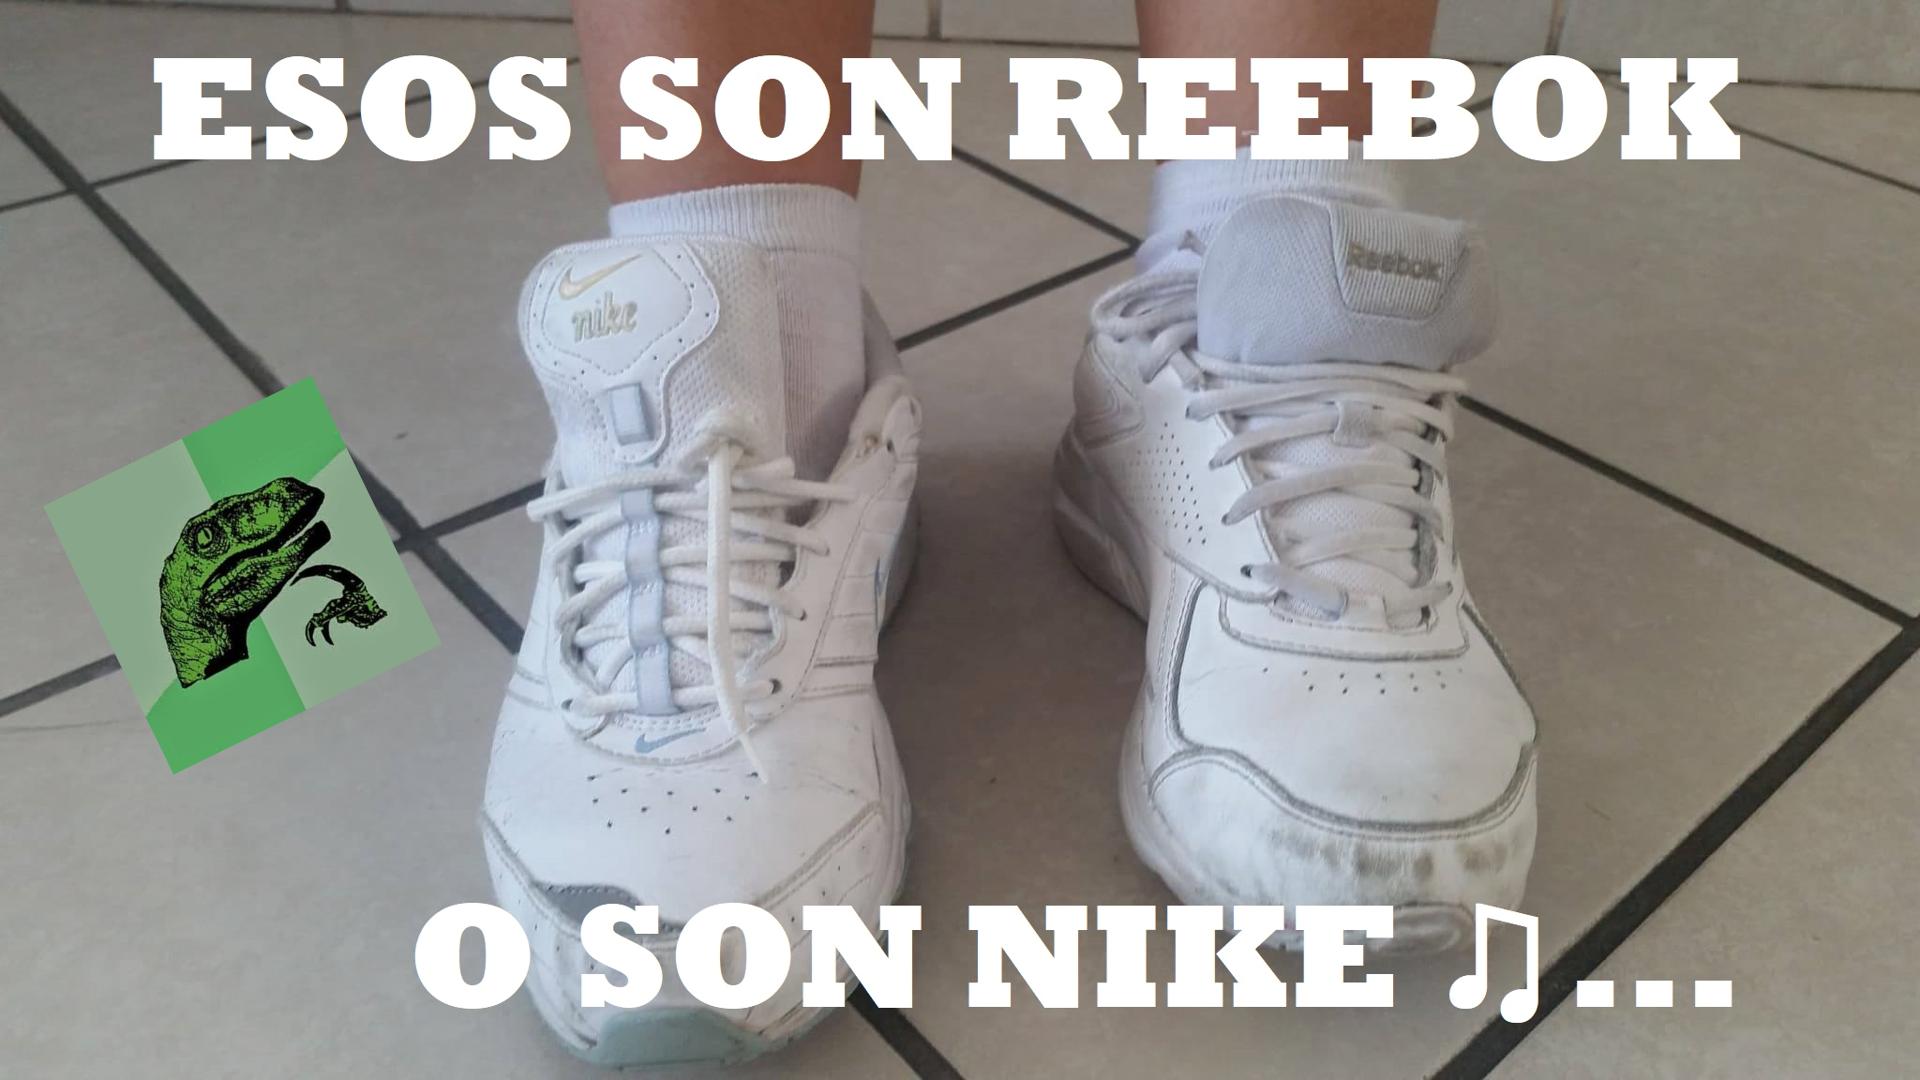 pico Pero Pelmel  Esos son reebok o son nike ♫... Tenis para gente cool, porque ser cool es  chido ;) | Nike, Reebok, Memes